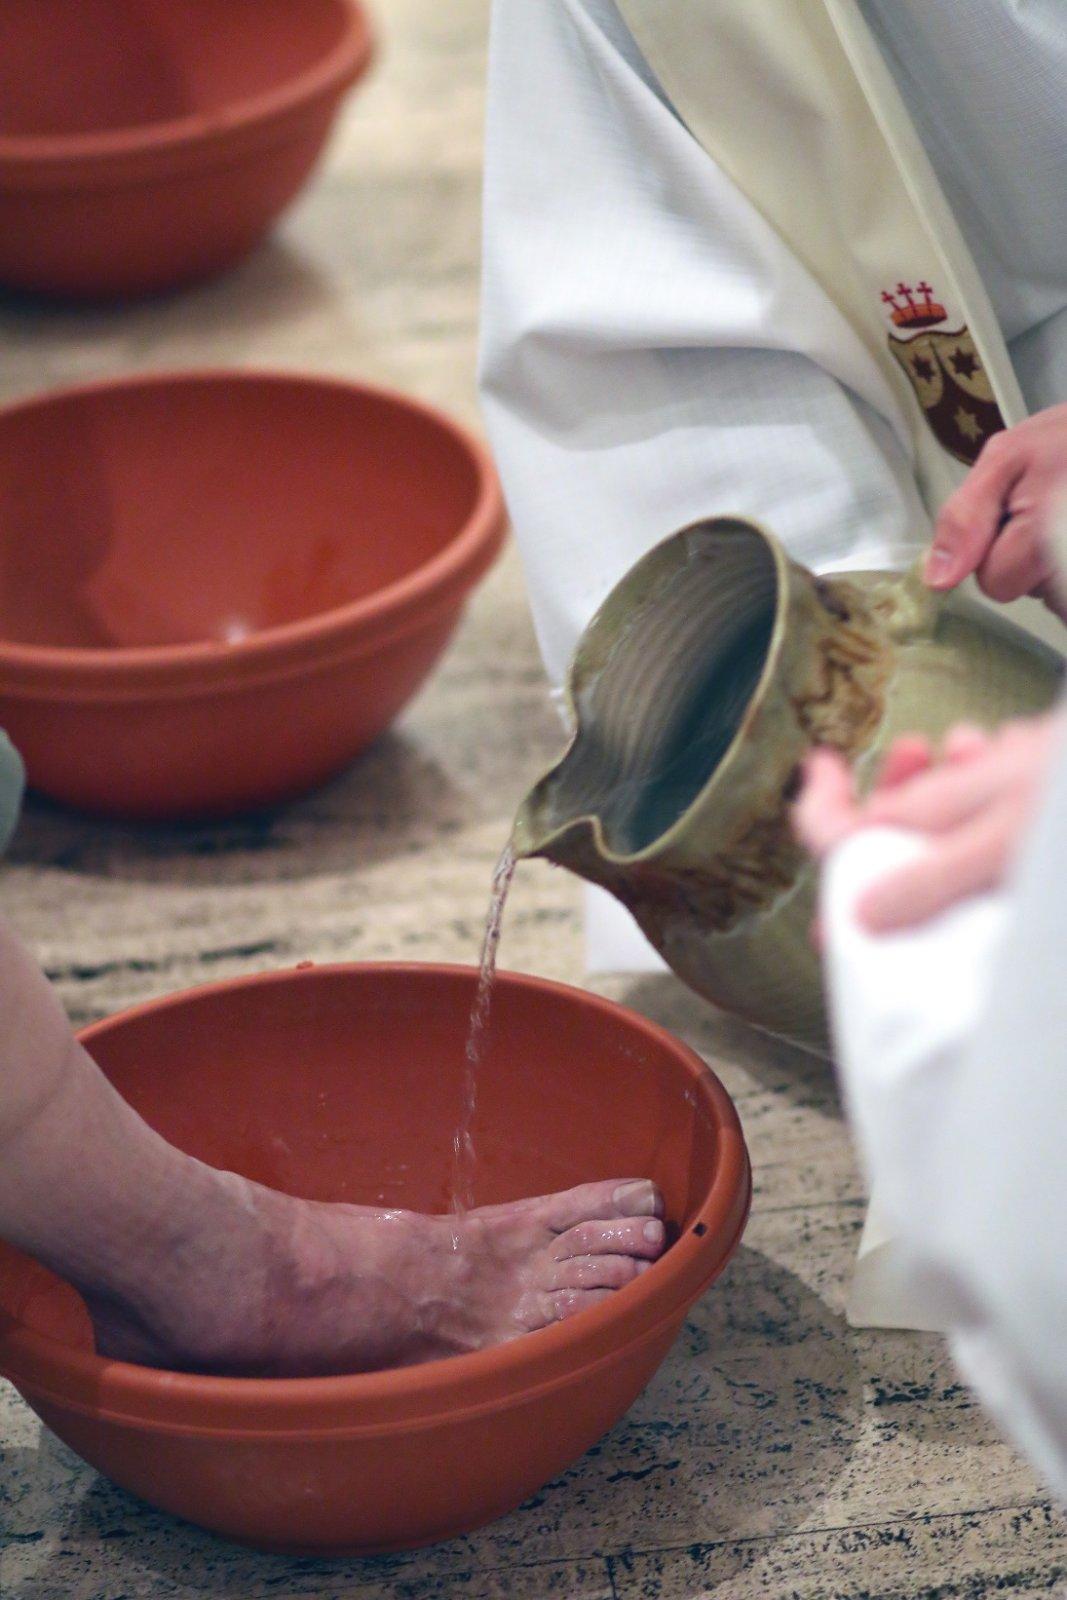 April 2014, Holy Thursday Mass